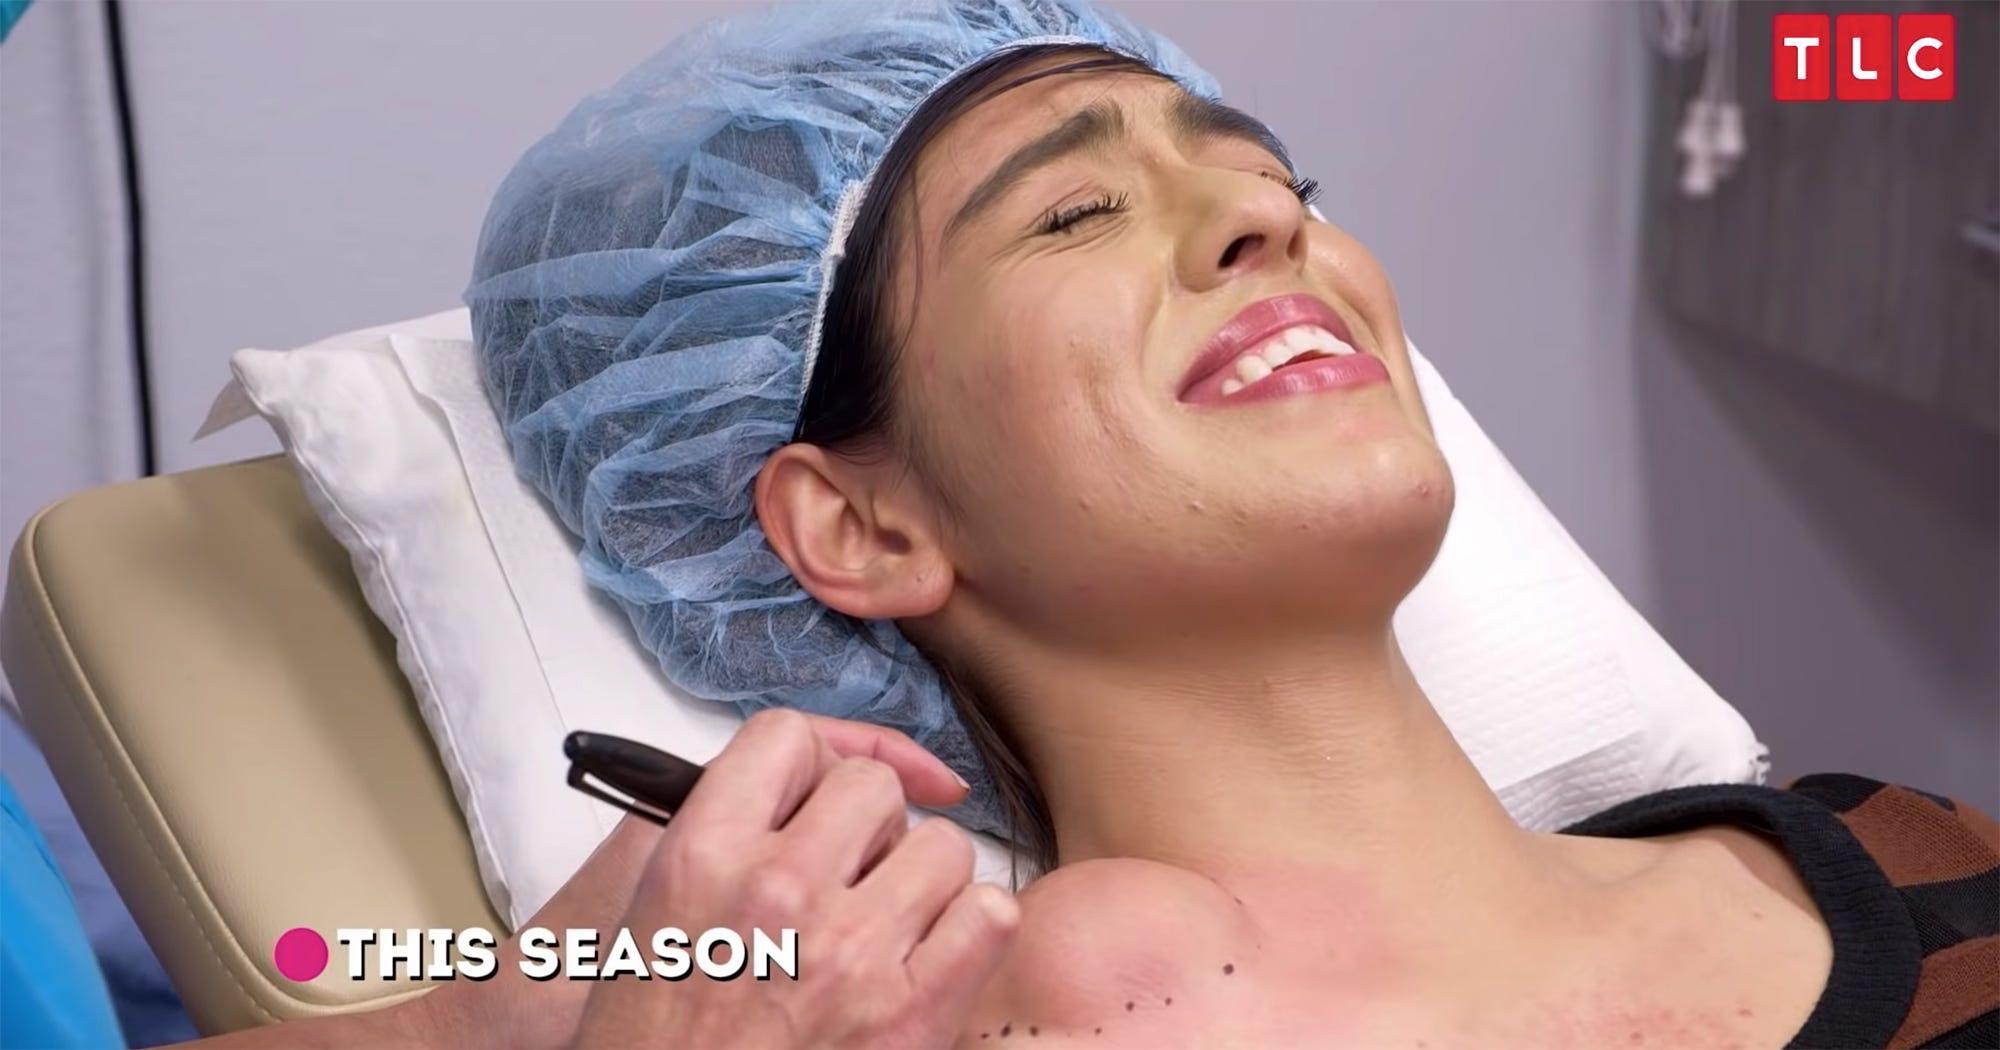 Dr Pimple Popper Season 2 Episode 2 Recap: Cyst & Tumor